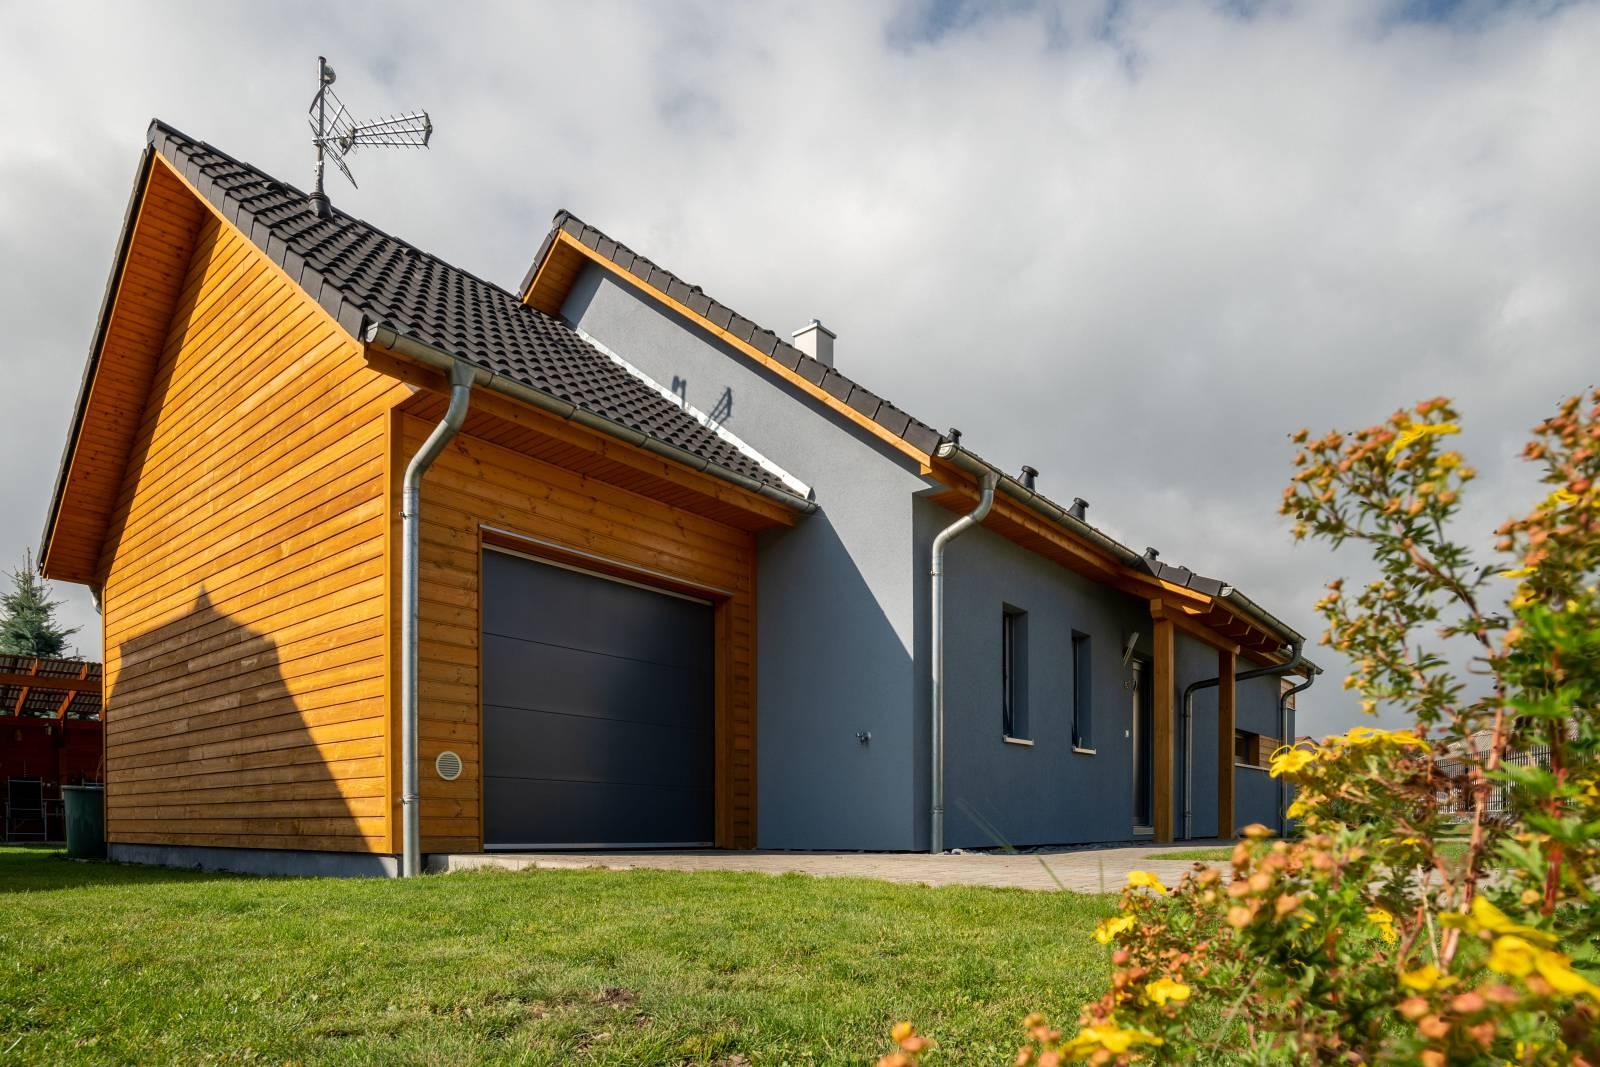 Montovaný dom na kľúč - Largo 85 s garážou, podkrovím a zimnou záhradou